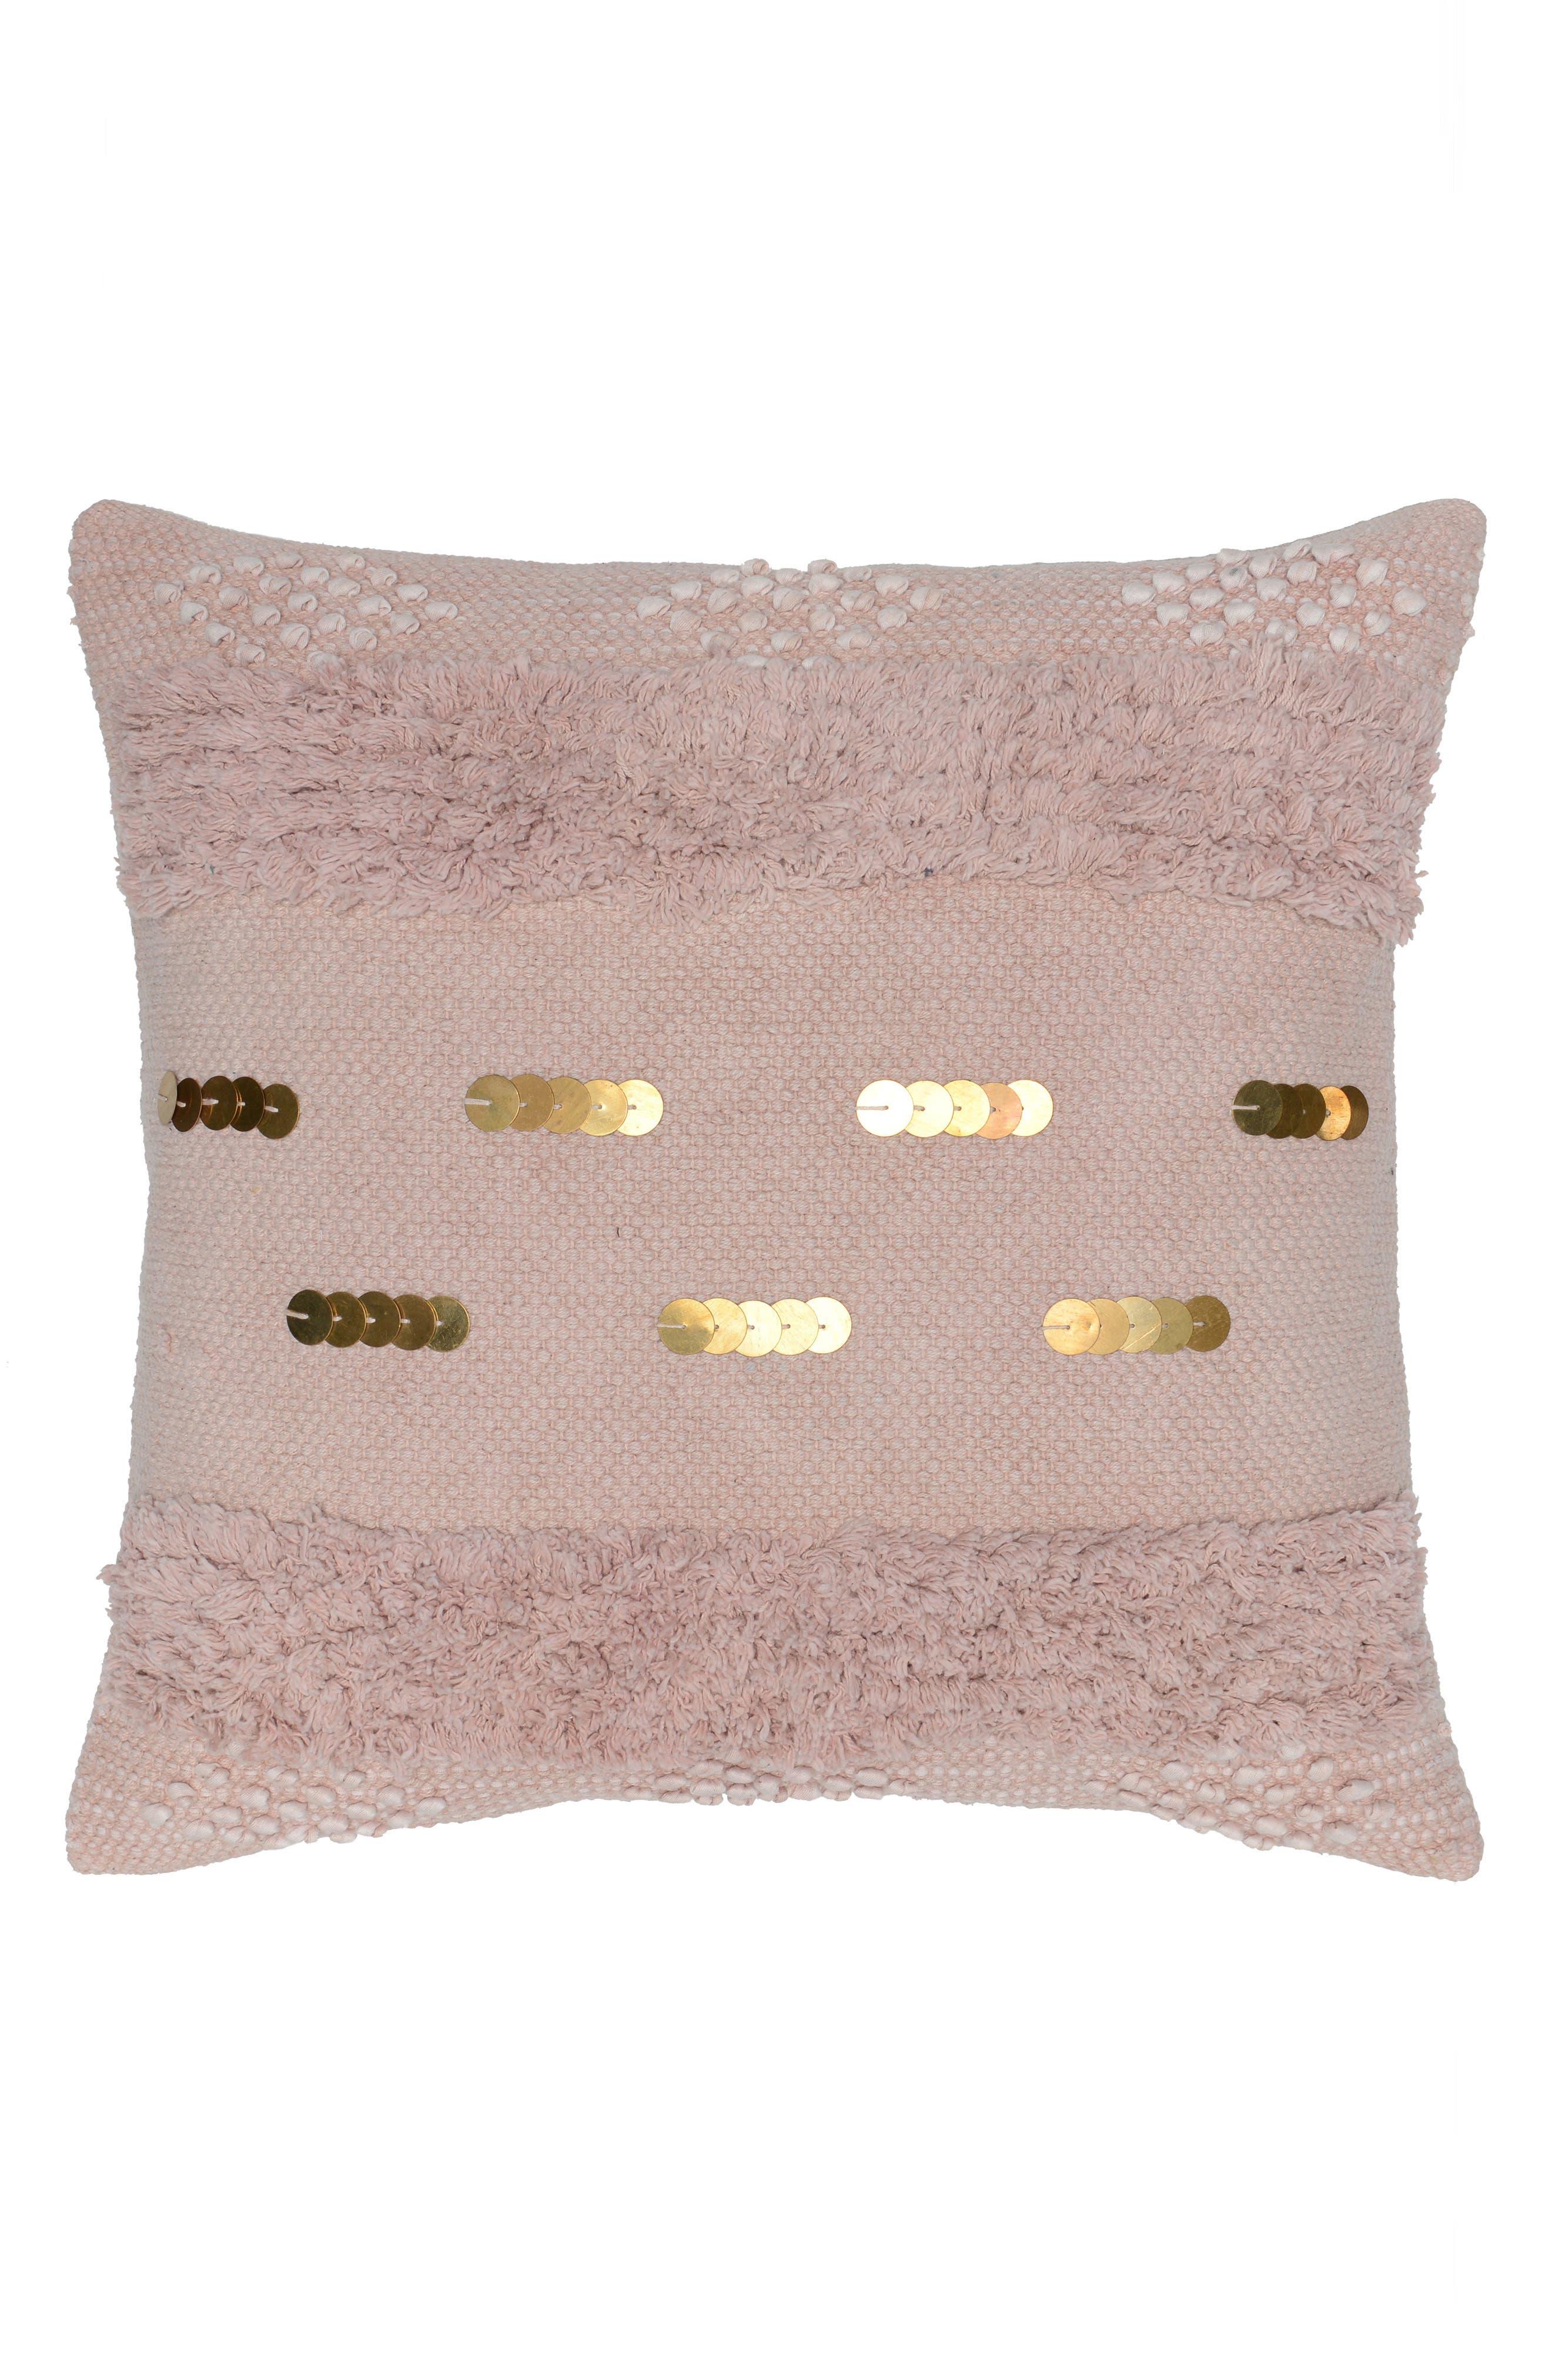 Seine Pillow,                             Main thumbnail 1, color,                             Blush